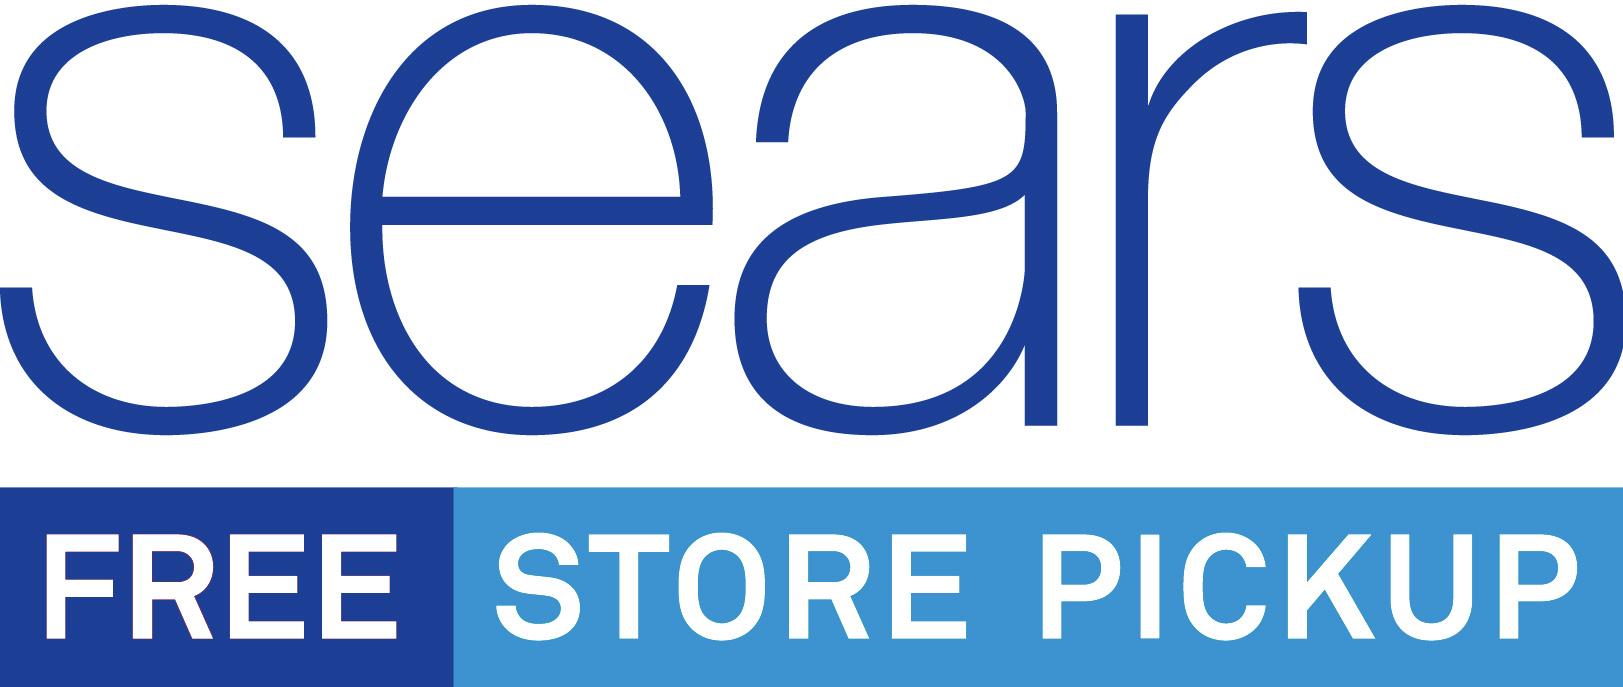 FREESTOREPICKUP-Sears